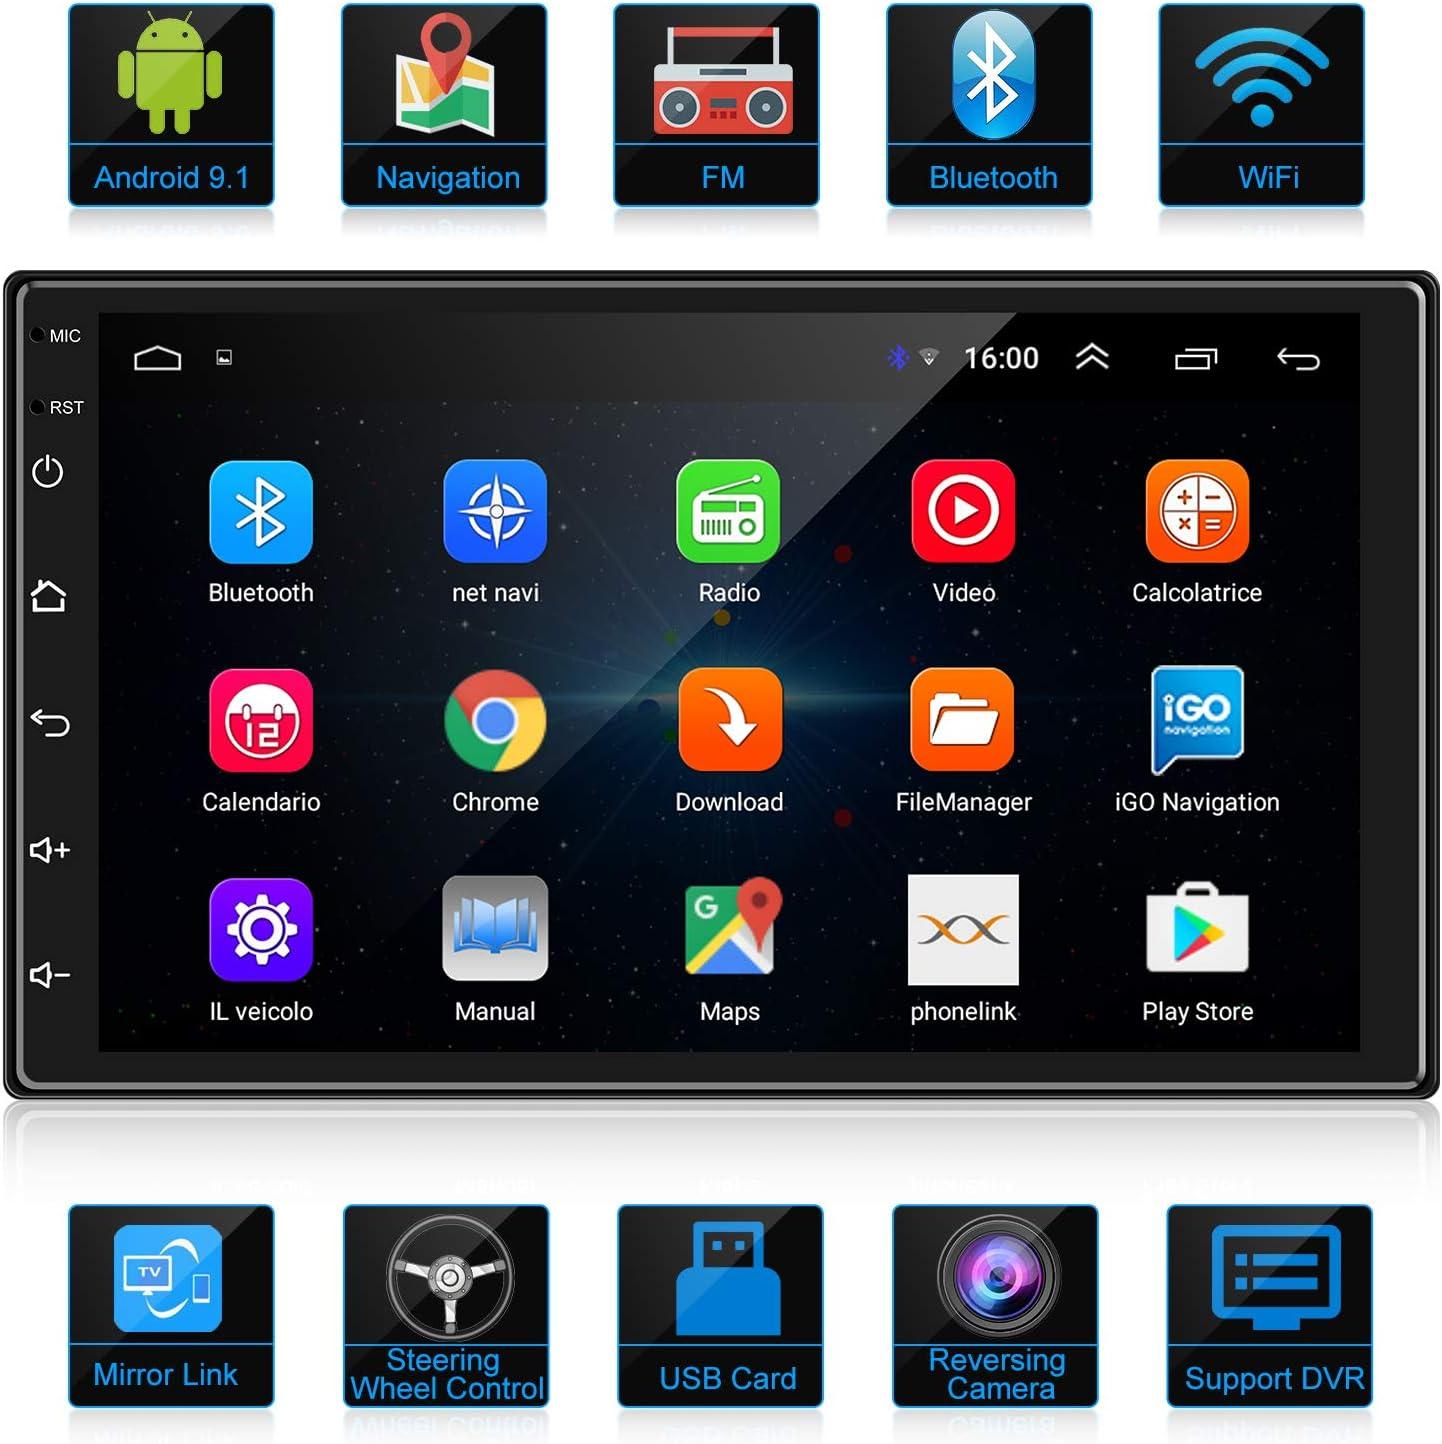 ANKEWAY 2 DIN Android 9.1 Radio del Coche Navegación GPS 7 Pulgadas 1080P HD Pantalla Táctil WiFi/Bluetooth Autoradio Manos Libres 1G/16G Multimedia Car Stereo+Internet WiFi+Cámara de Visión Trasera